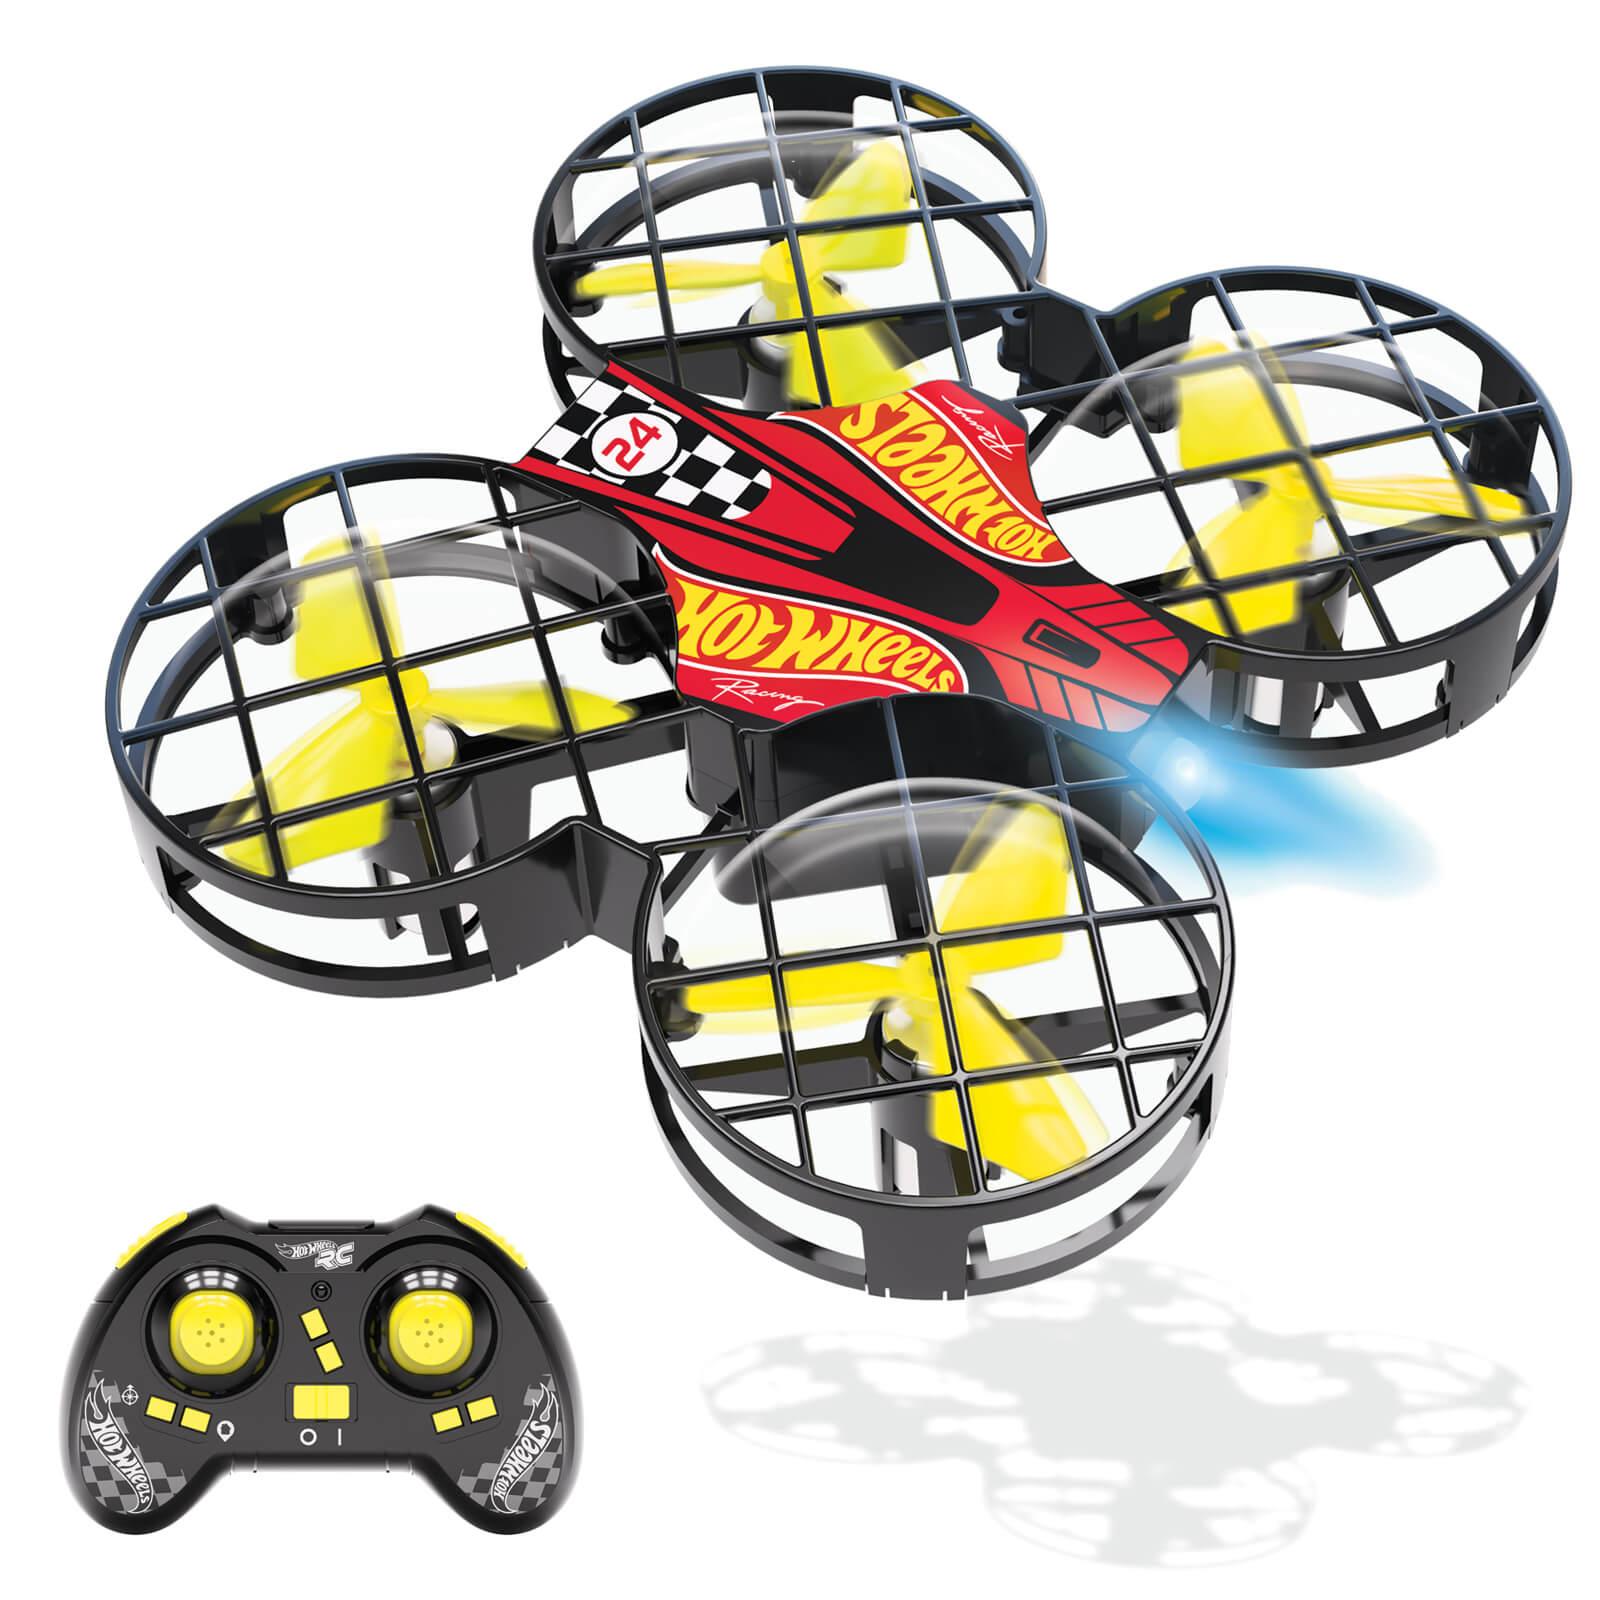 Bladez Toyz Hot Wheels DRX Hawk Racing Drone